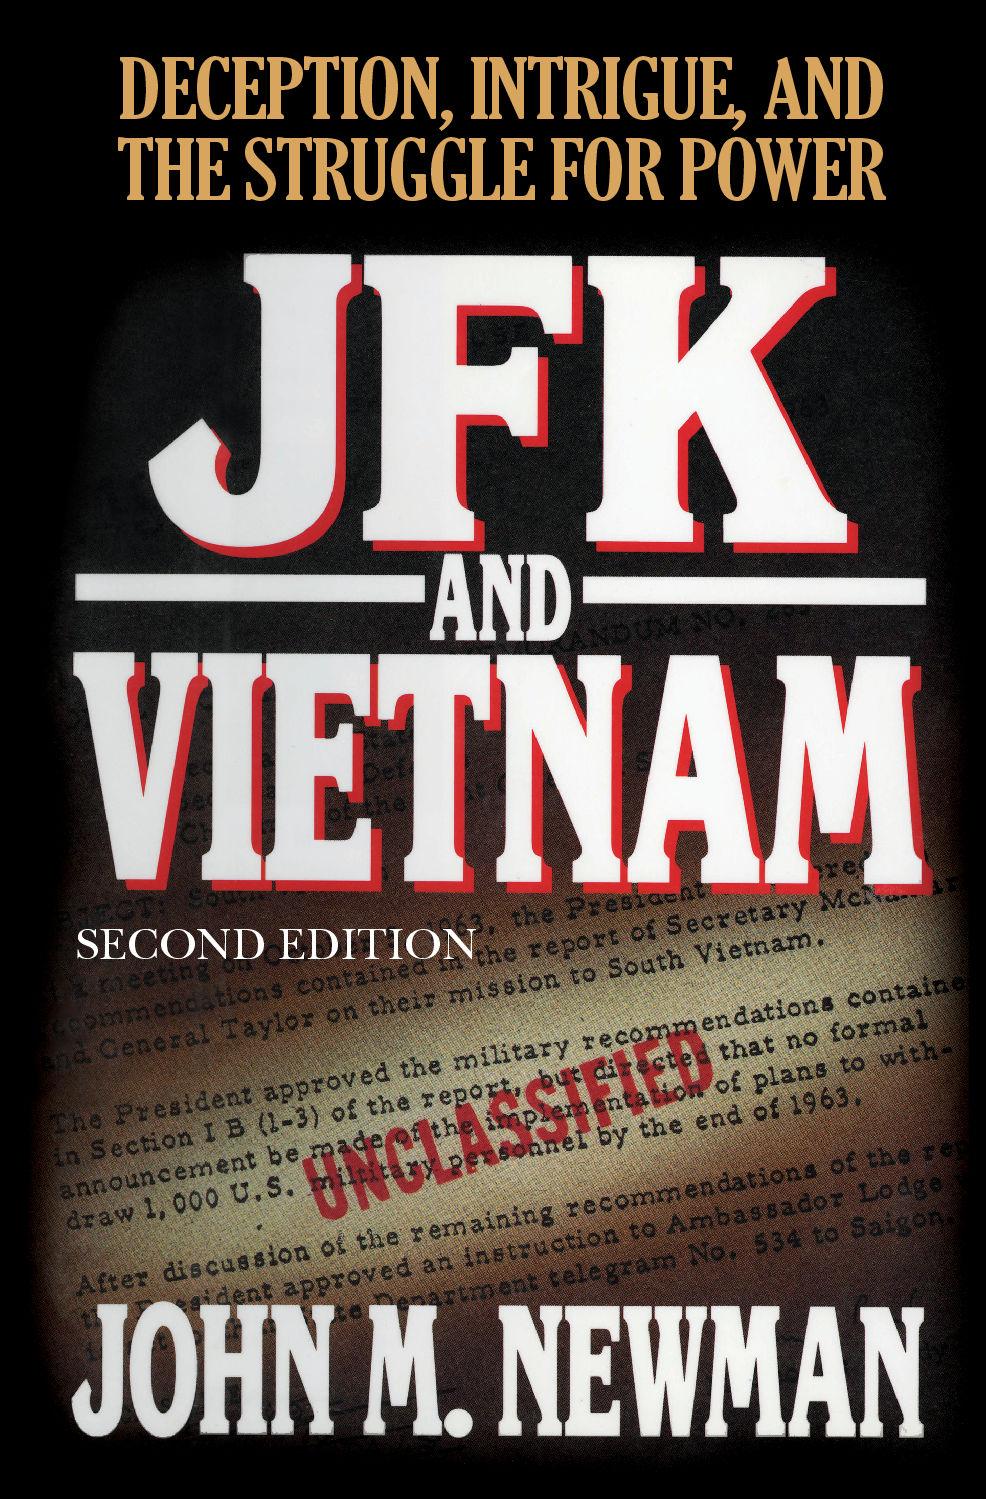 JFKANDVIETNAM_Coverhighrez Publications and Books by John Newman